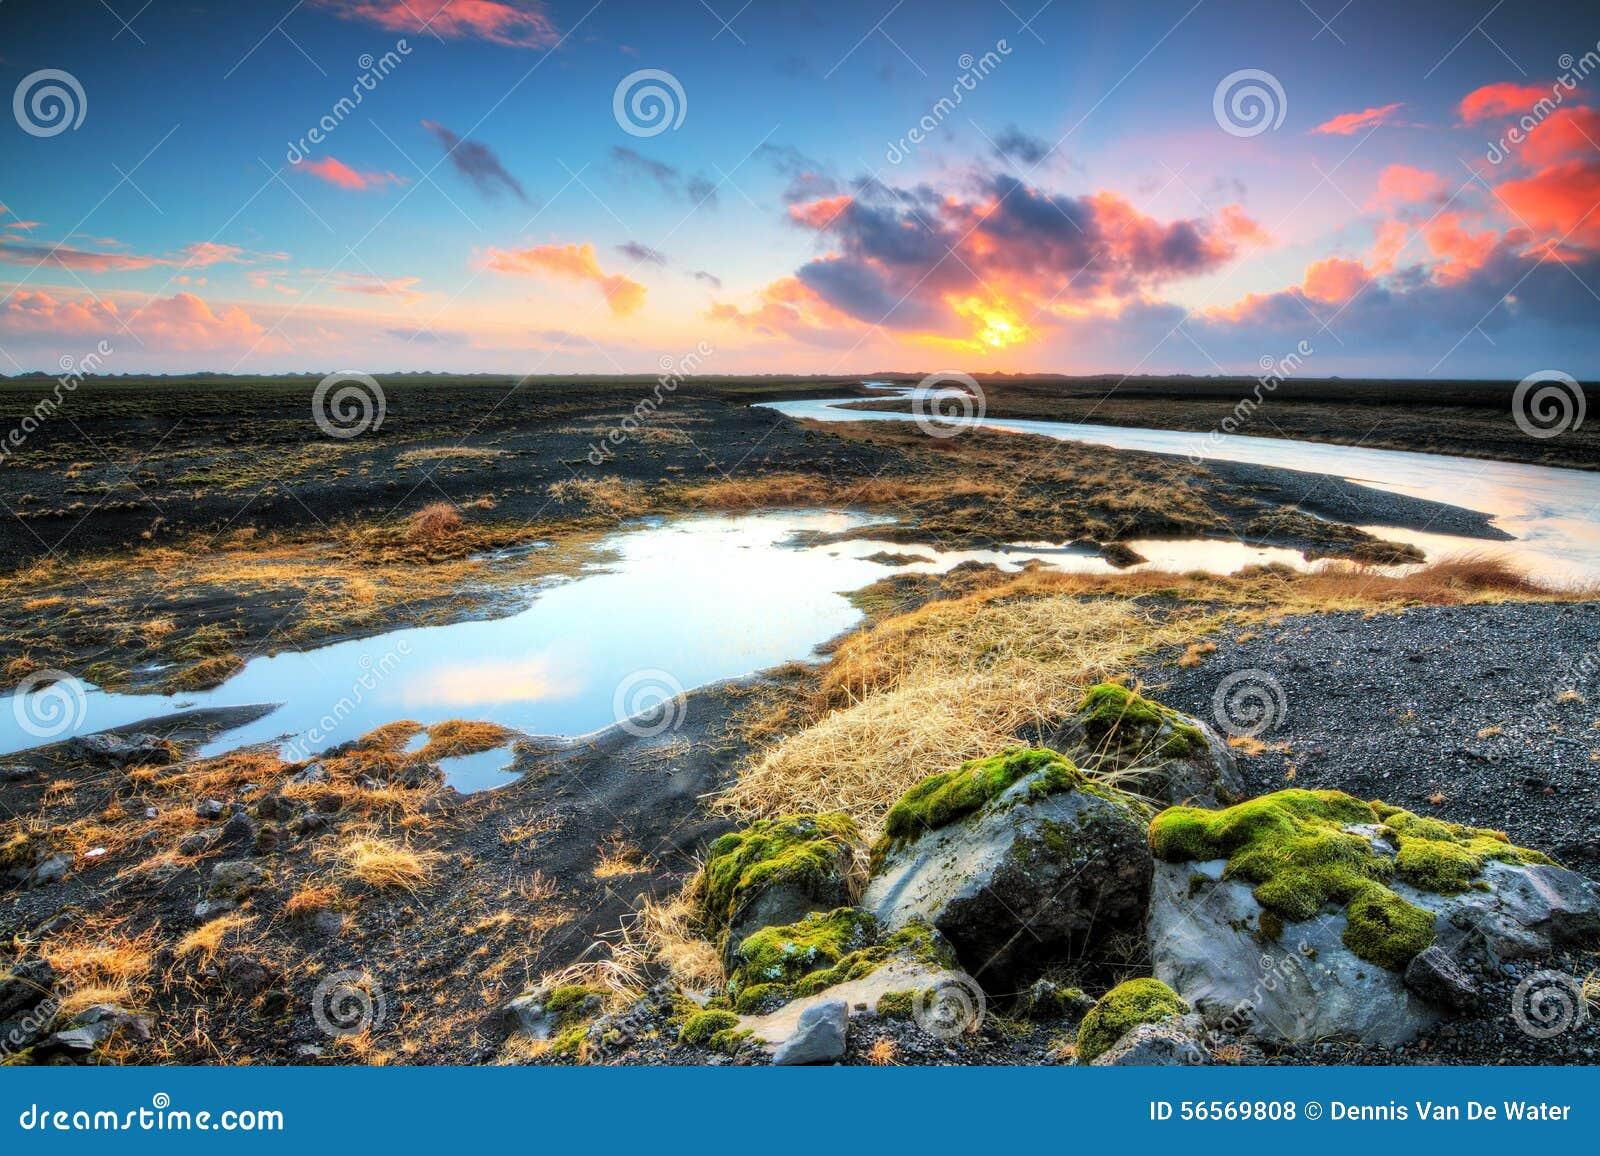 Download Ηφαιστειακός ποταμός ανατολής Στοκ Εικόνες - εικόνα από dusk, ουρανός: 56569808